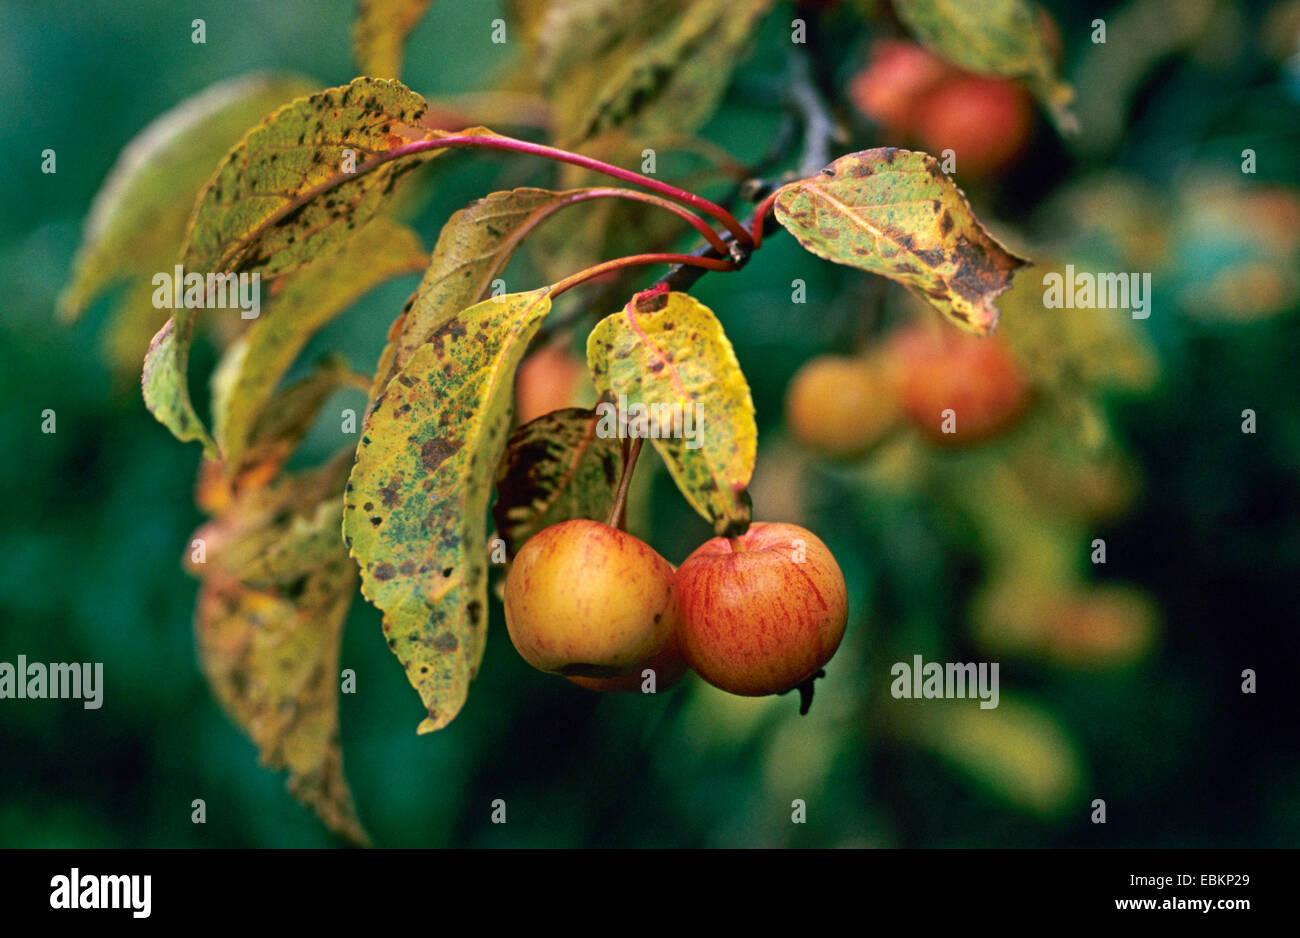 apple tree (Malus 'Professor Sprenger', Malus Professor Sprenger), cultivar Professor Sprenger - Stock Image